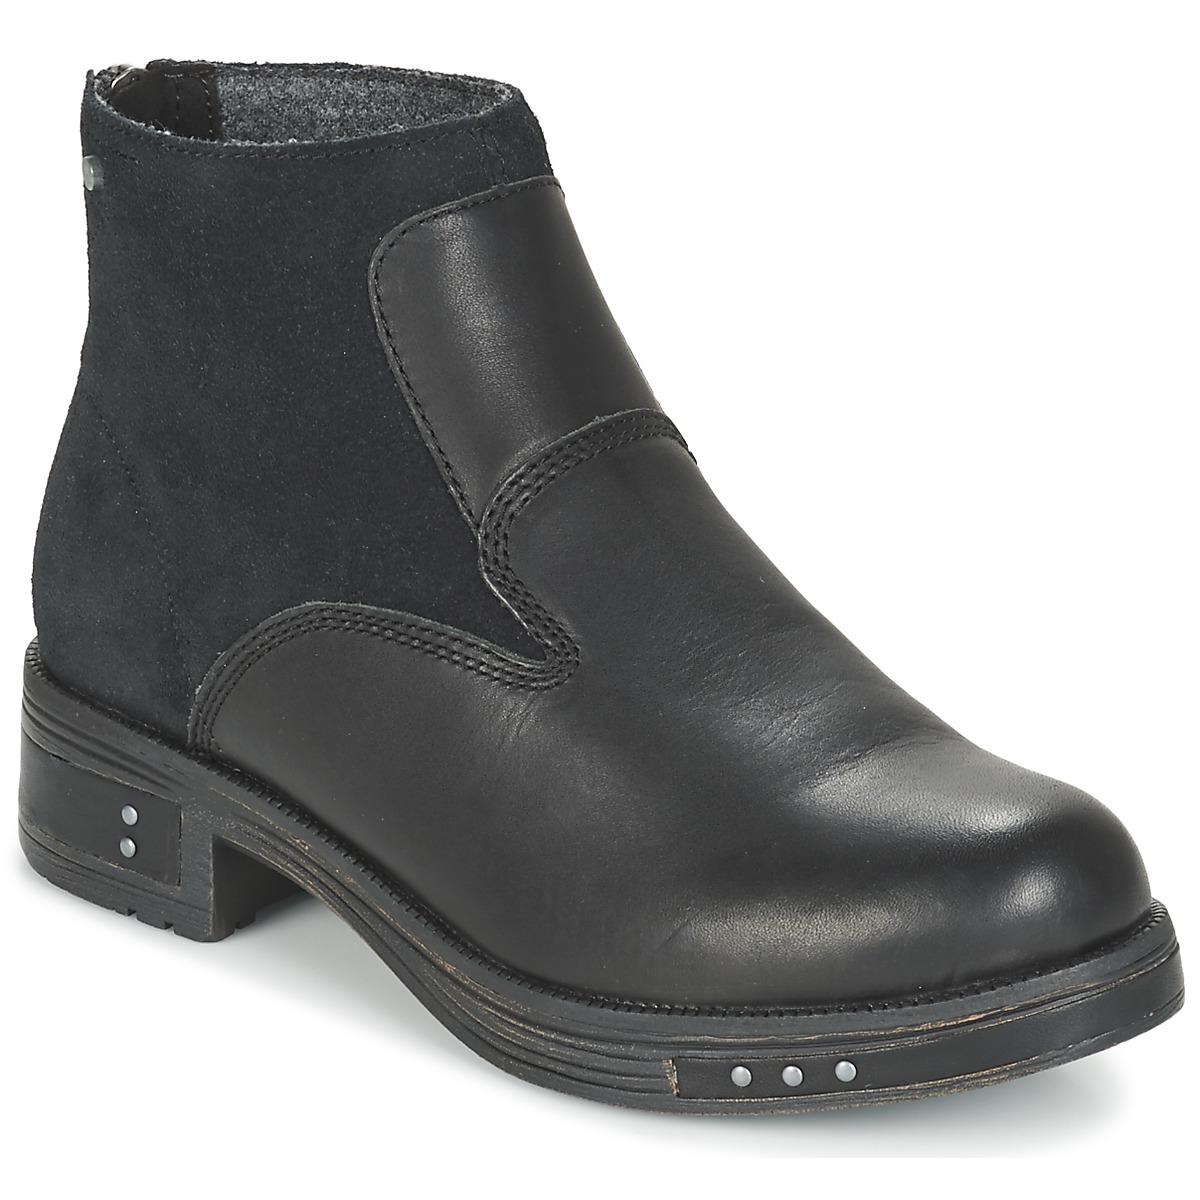 Caterpillar ZOE Schwarz - Kostenloser Versand bei Spartoode ! - Schuhe Low Boots Damen 90,40 €